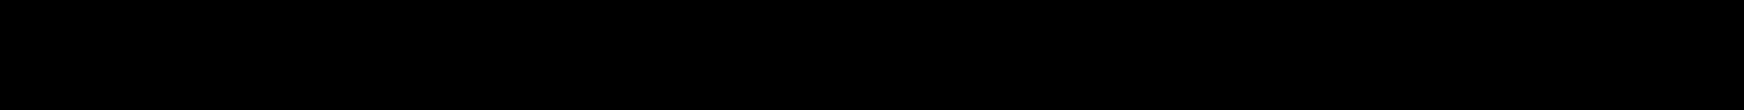 NeutraText-BoldItalic.otf